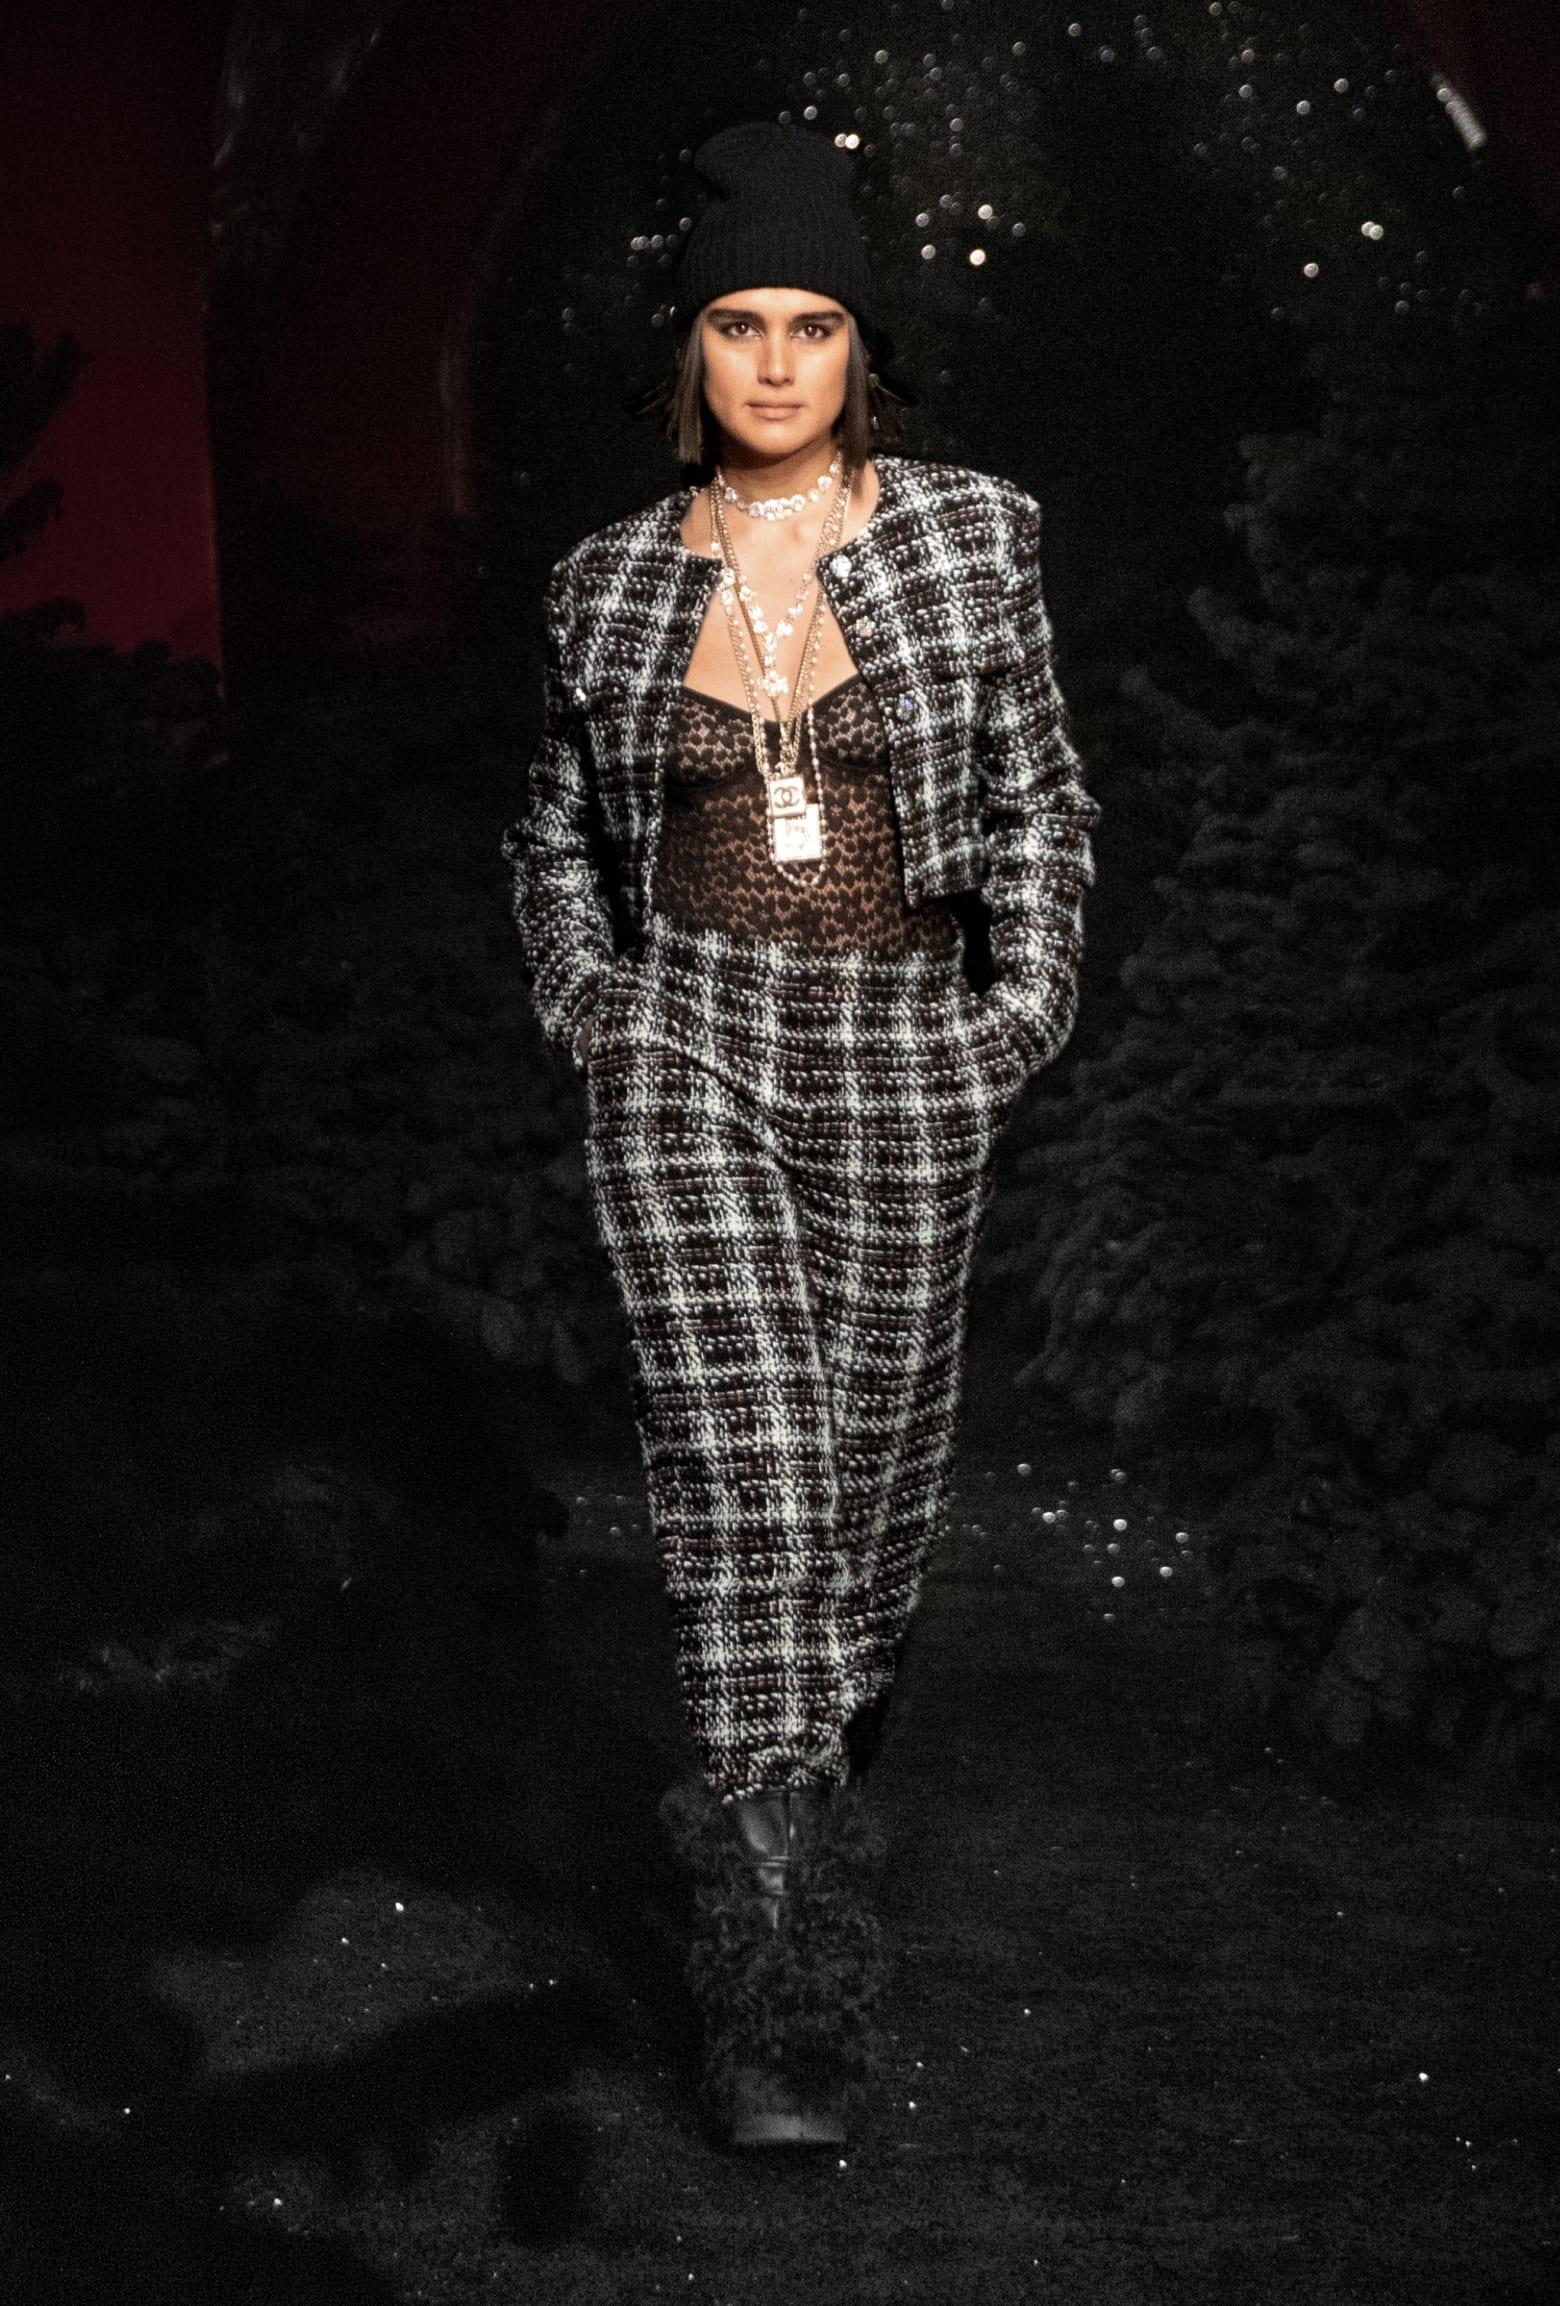 Chanel fall-winter 2021/2022